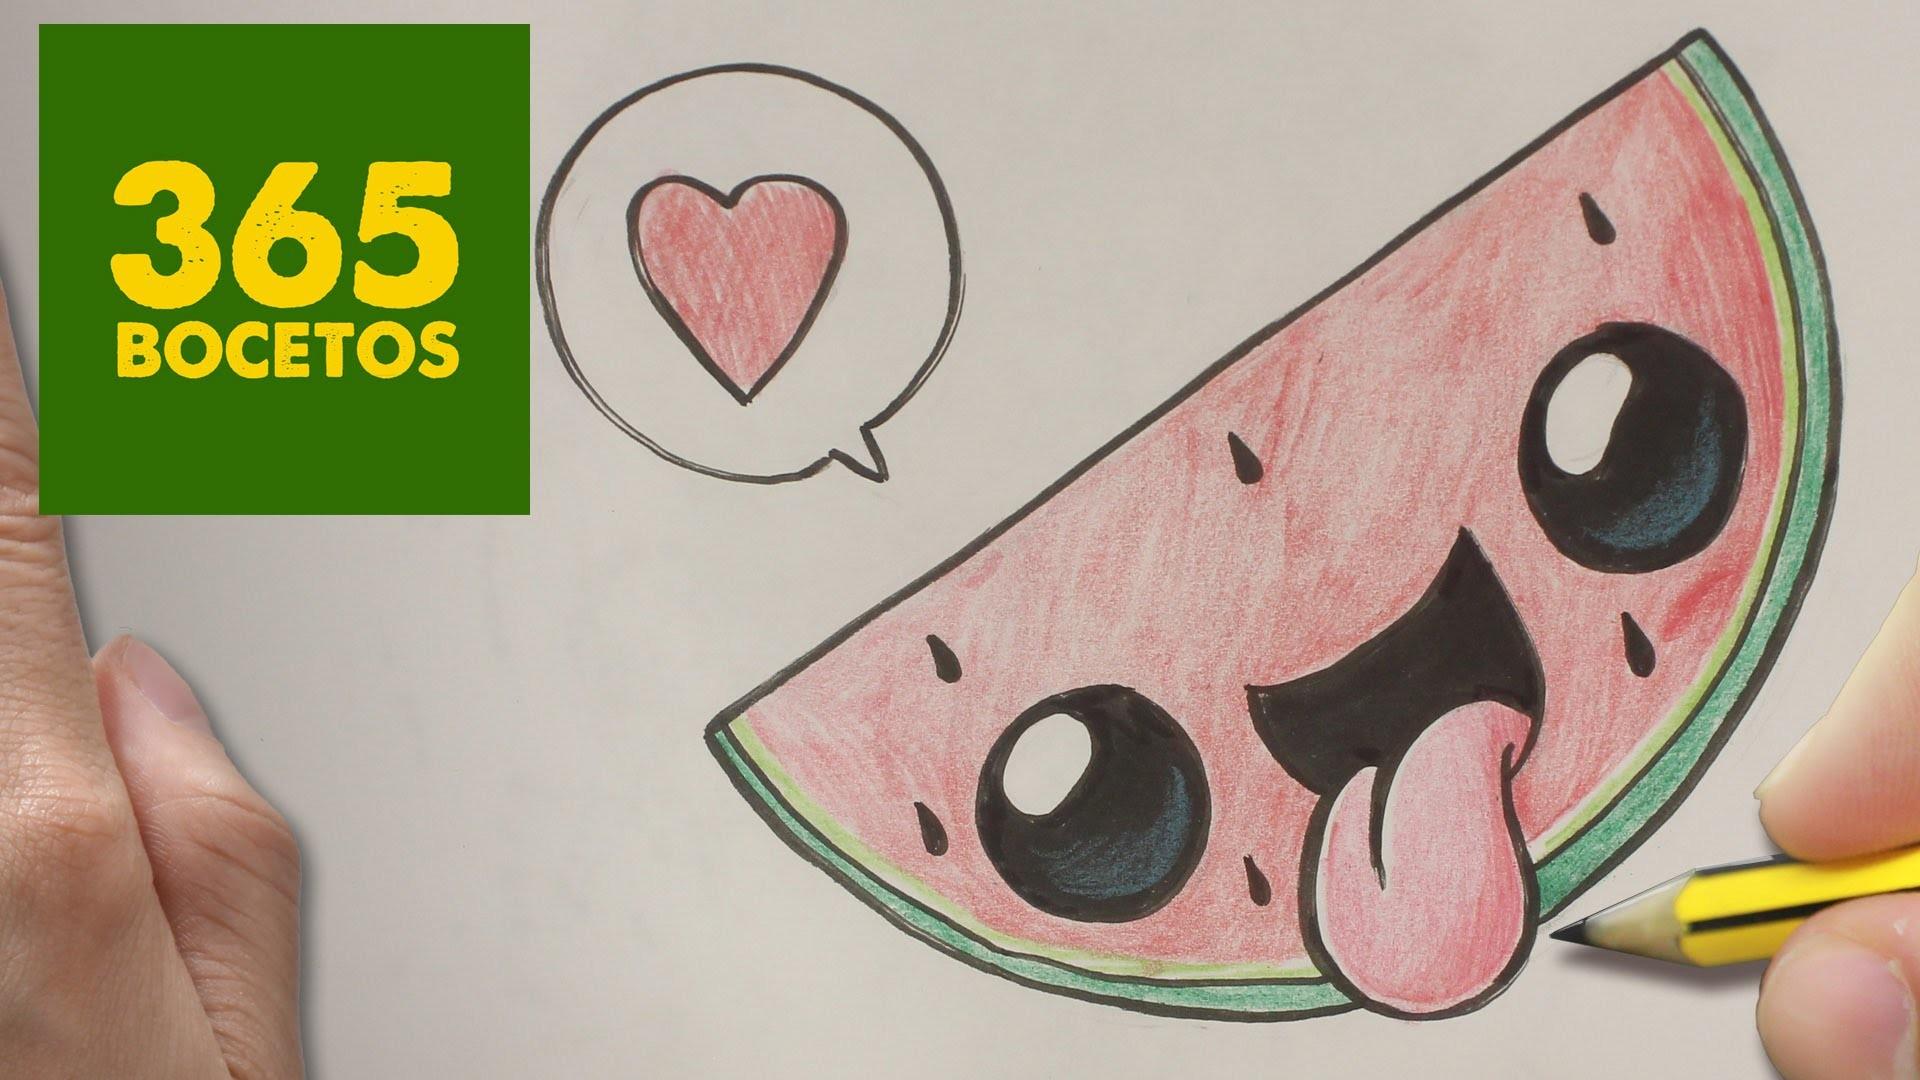 COMO DIBUJAR SANDIA KAWAII PASO A PASO - Dibujos kawaii faciles - How to draw a Watermelon